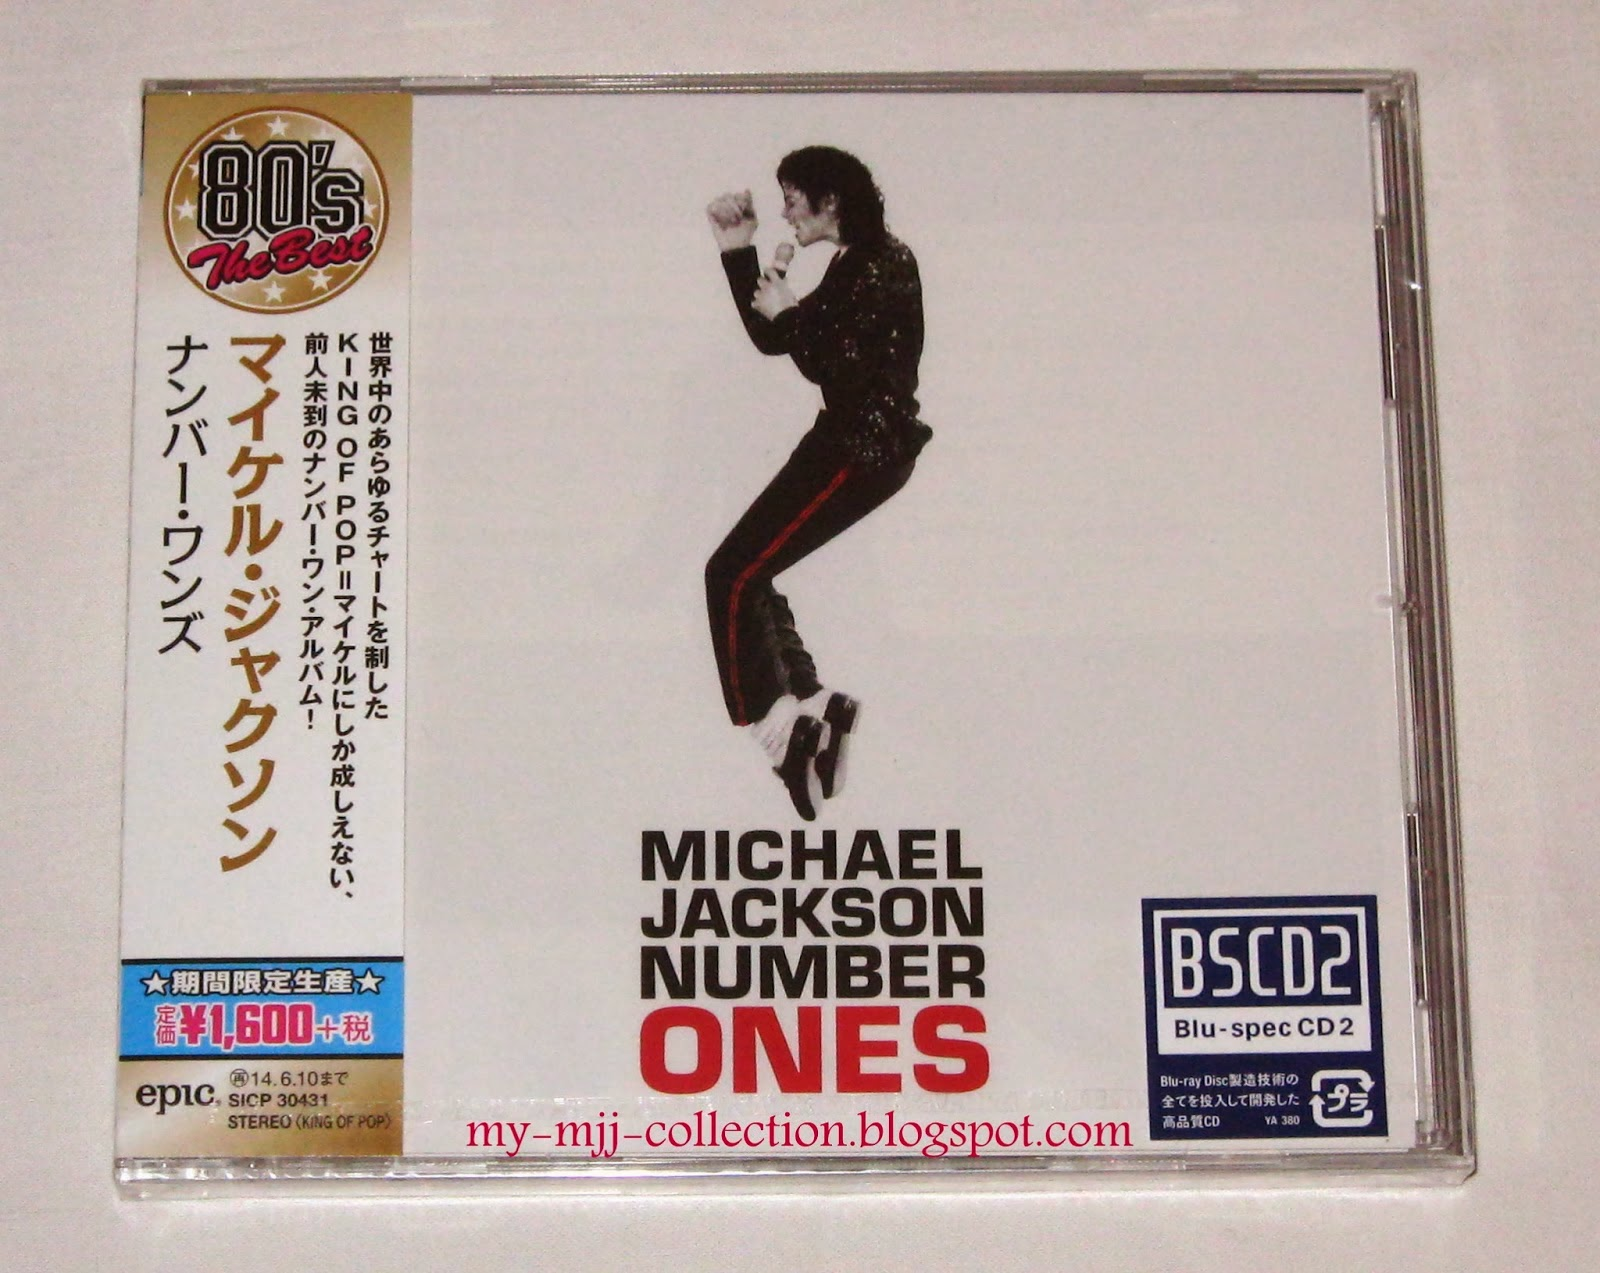 Michael Jackson - Number Ones (Blu-spec CD2) [SICP 30431/Japan/2013]   My MJJ Collection